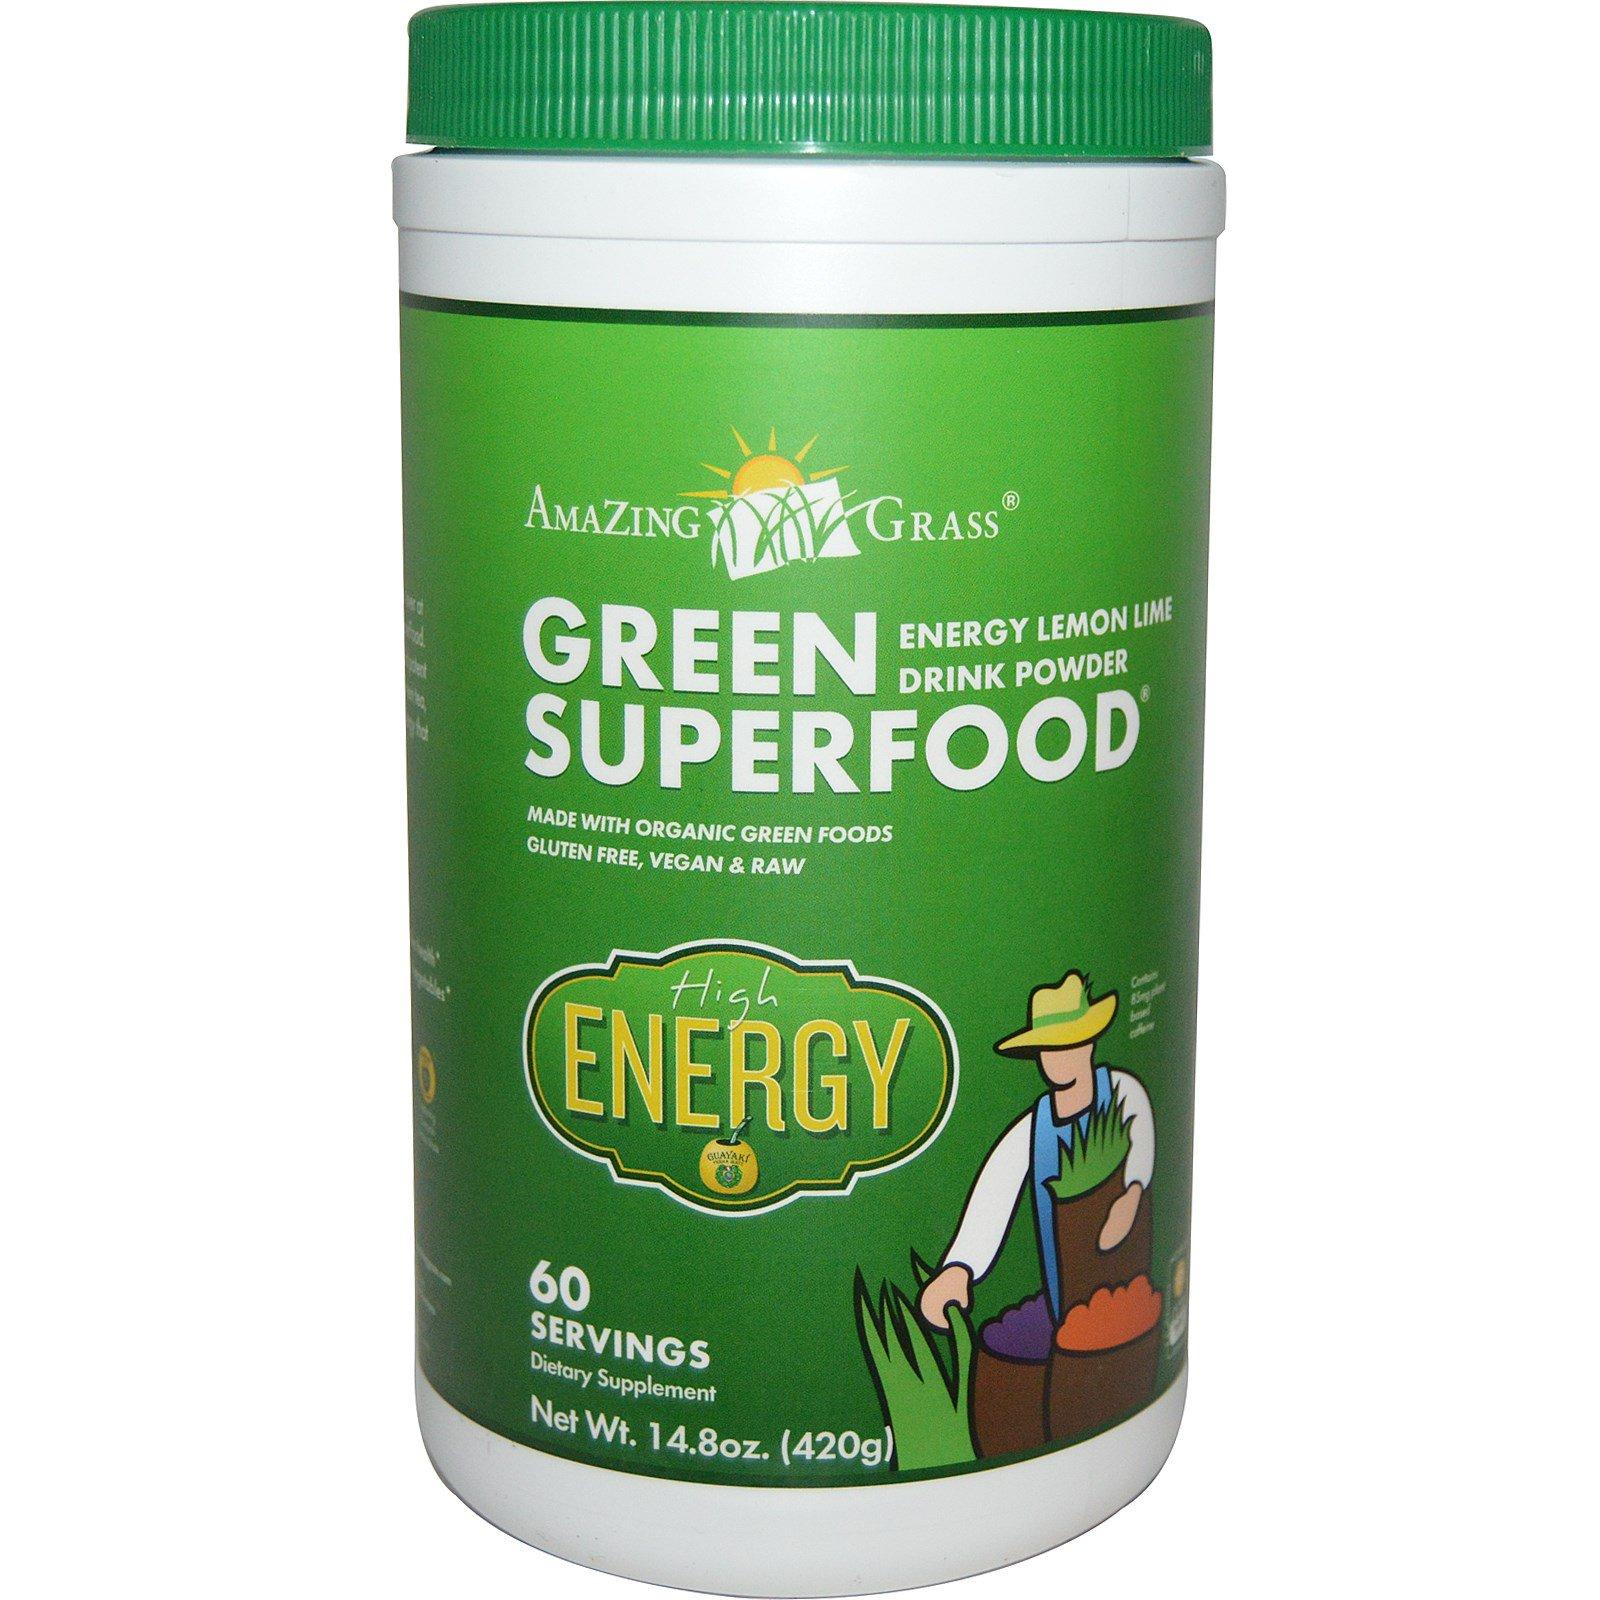 Amazing Grass, Green Superfood, Energy Lemon Lime Drink